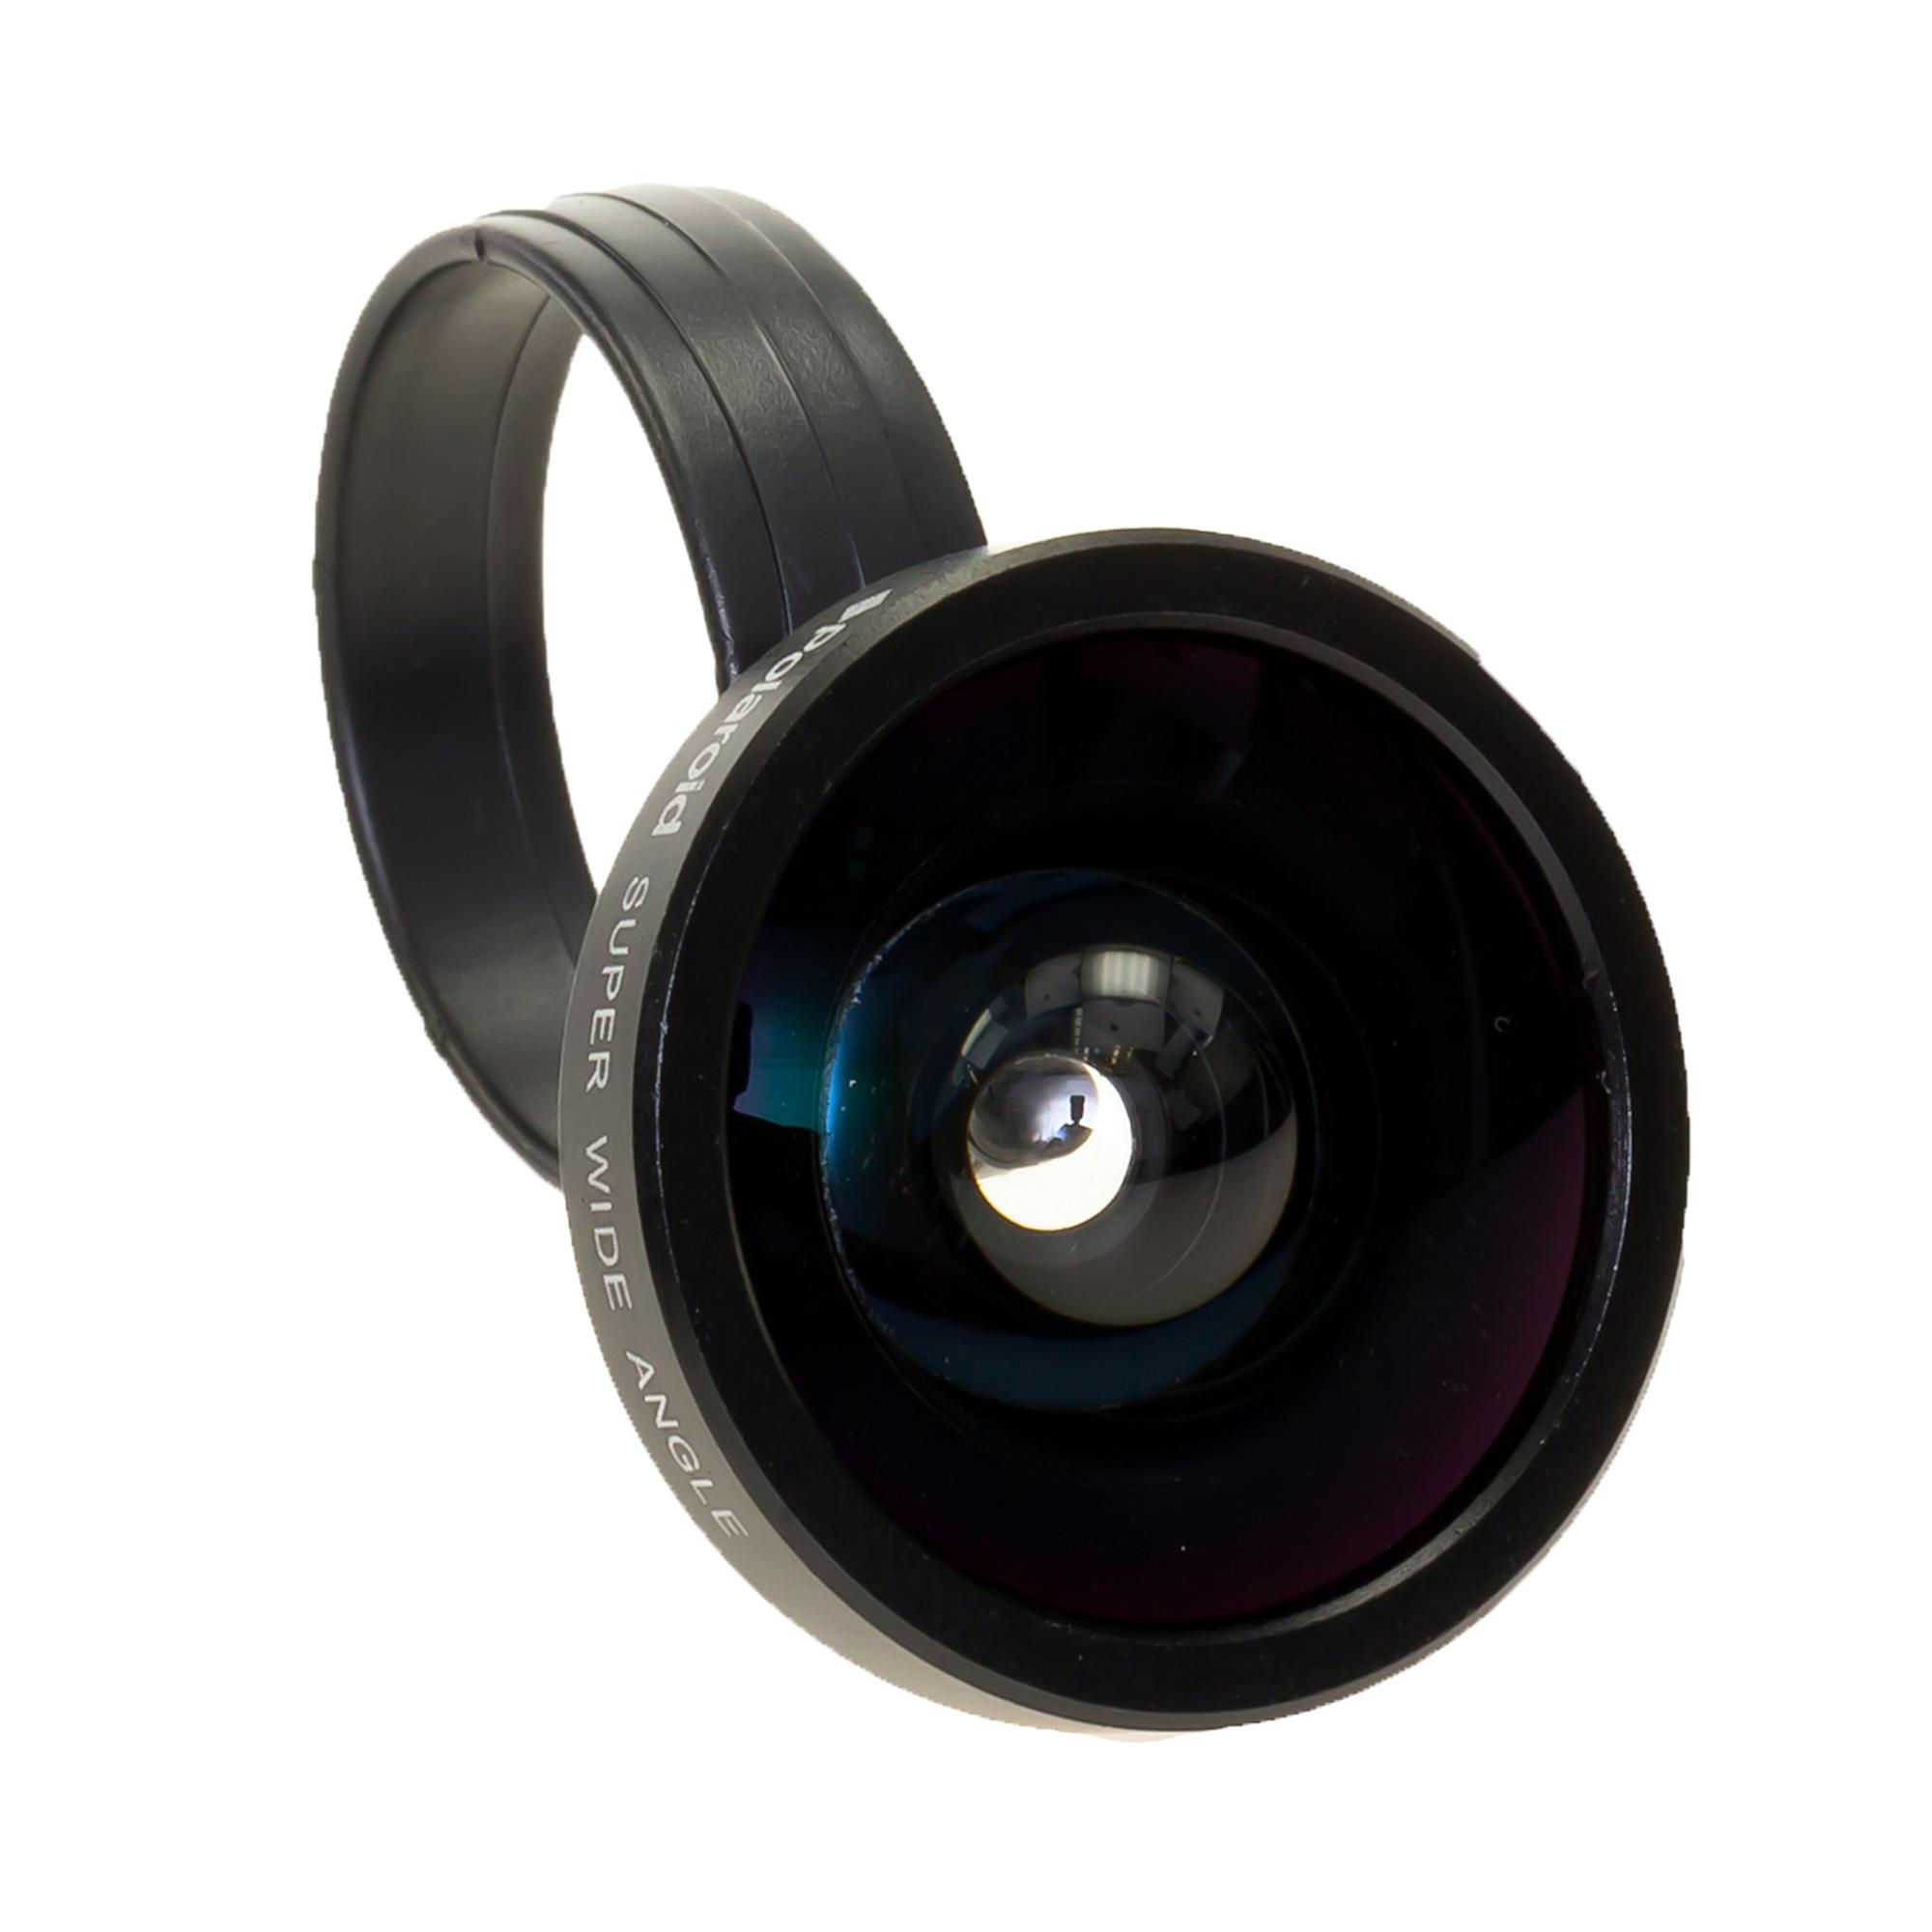 Beli Polaroid Lensa Smartphone 4X Super Wide Angle Lens Hitam Polaroid Online